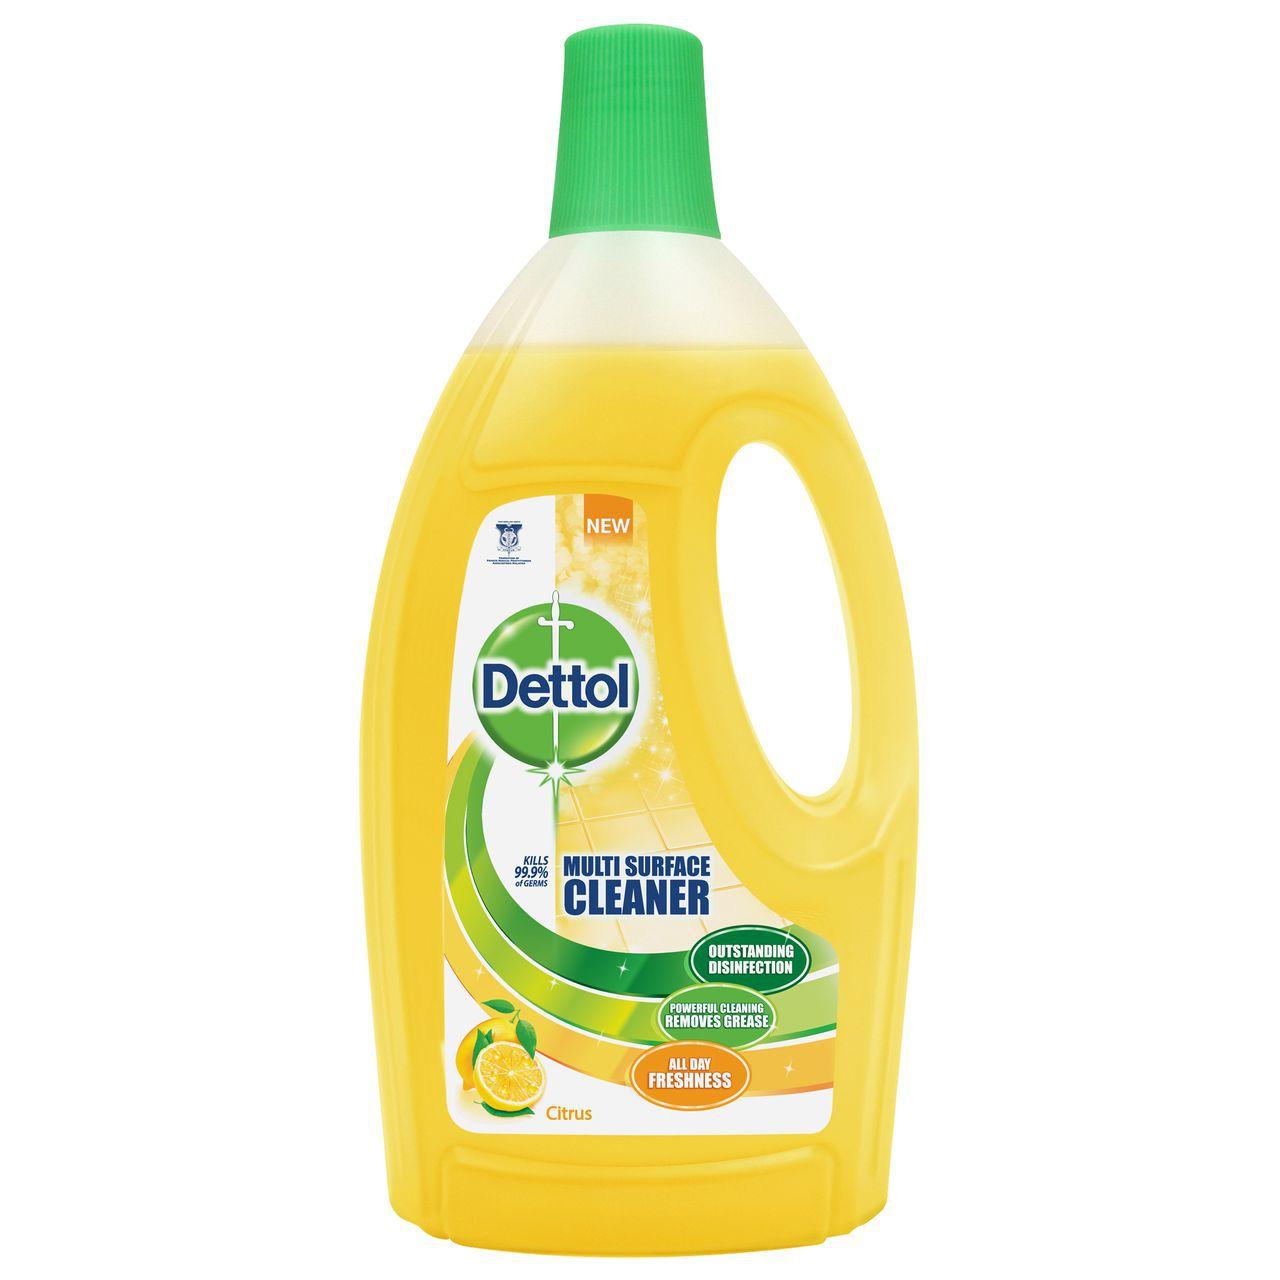 Dettol Multi Action Cleaner Citrus